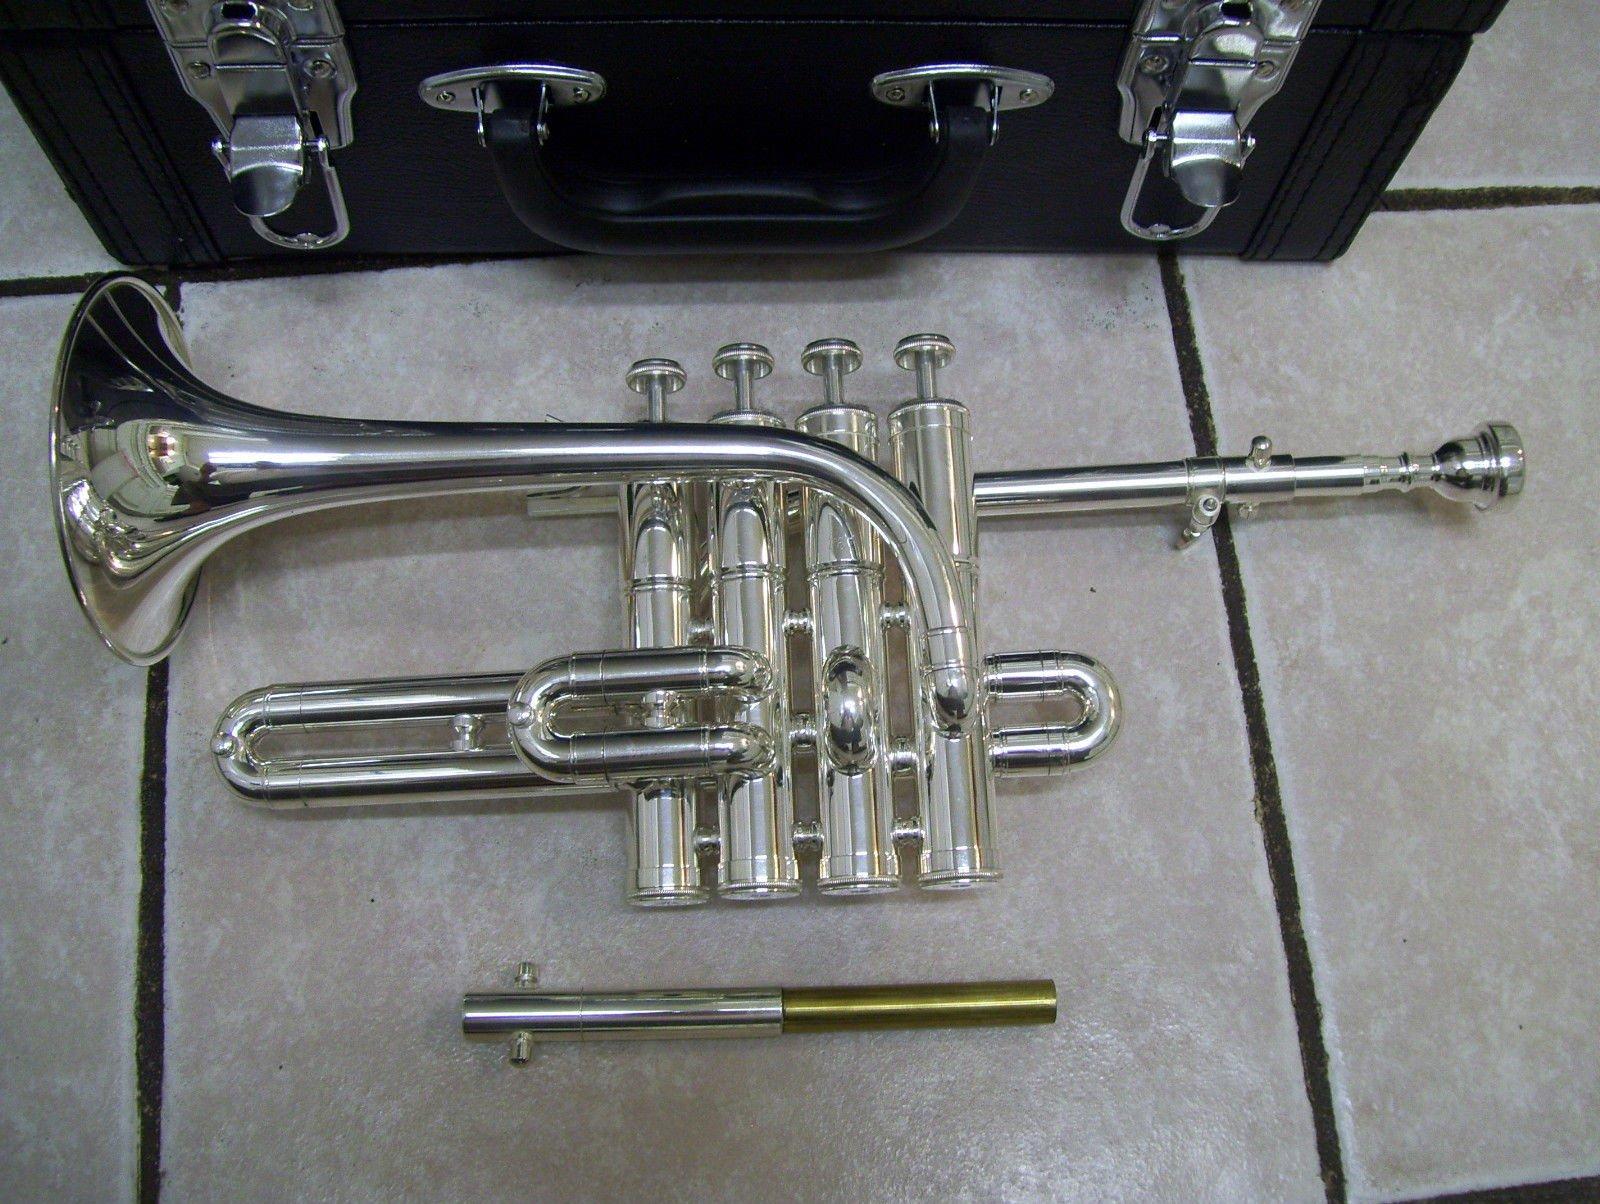 Piccolo trumpet, 4 piston, with hard case and mouthpiece by Maestro